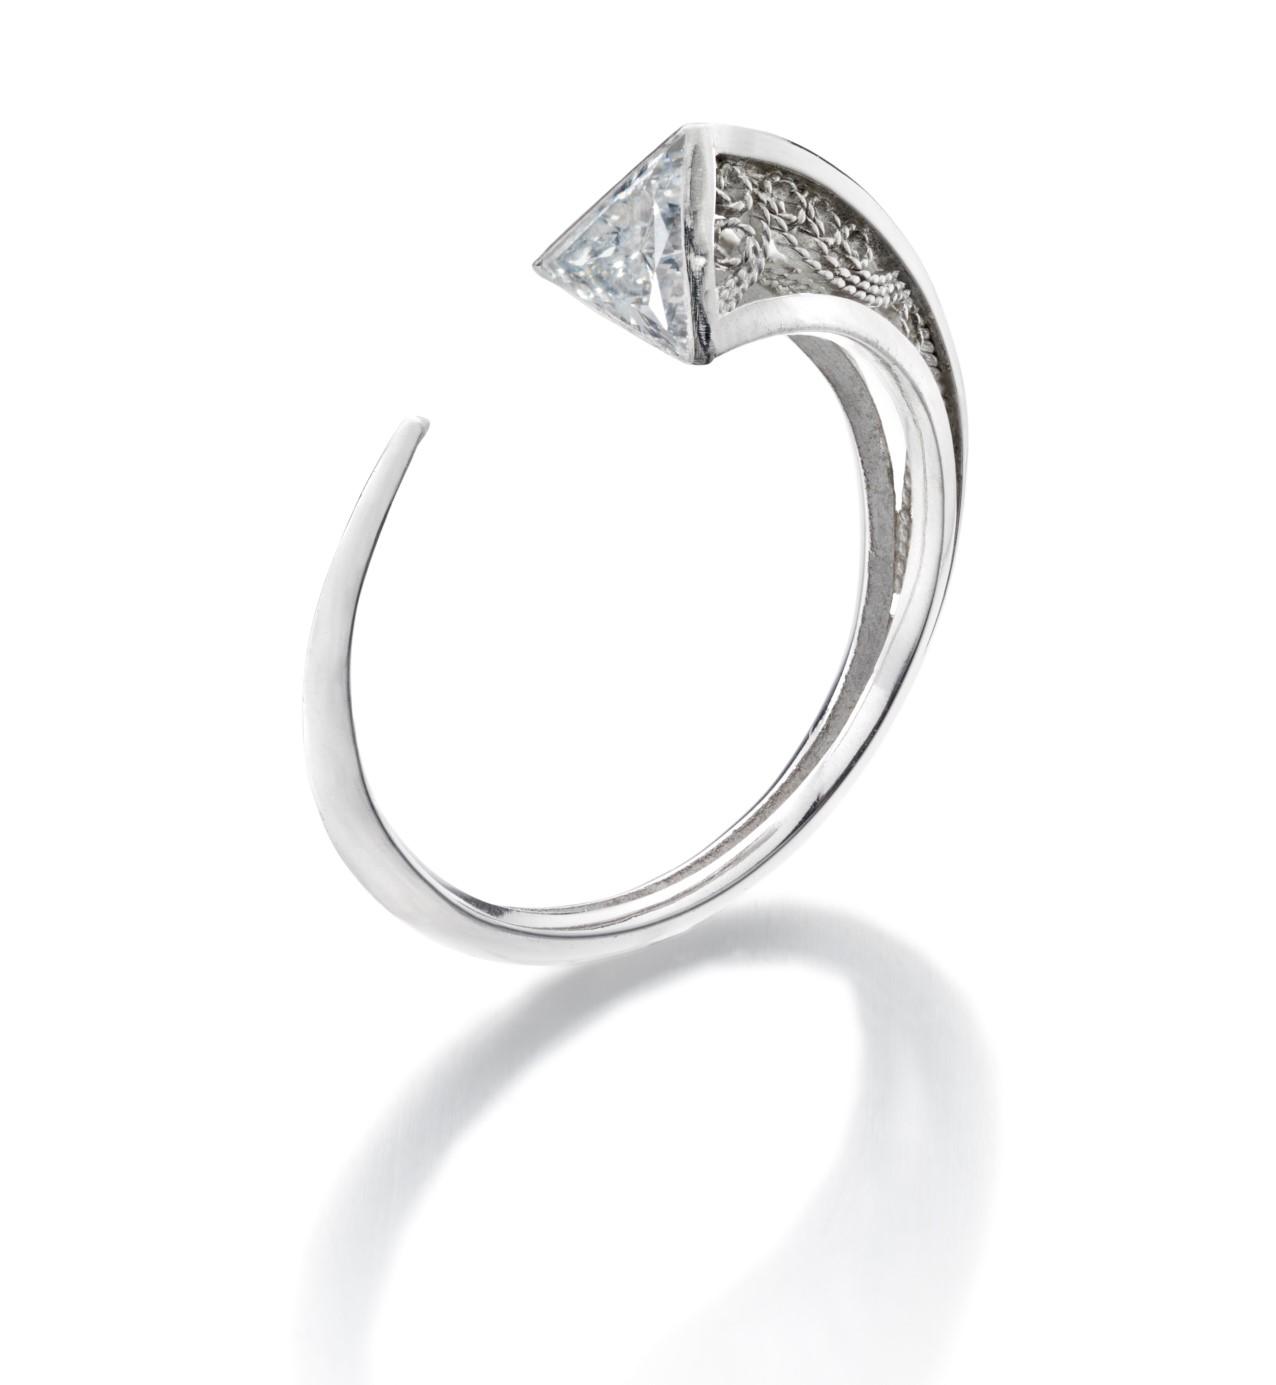 6.Diamond Ring_Helen London.jpg